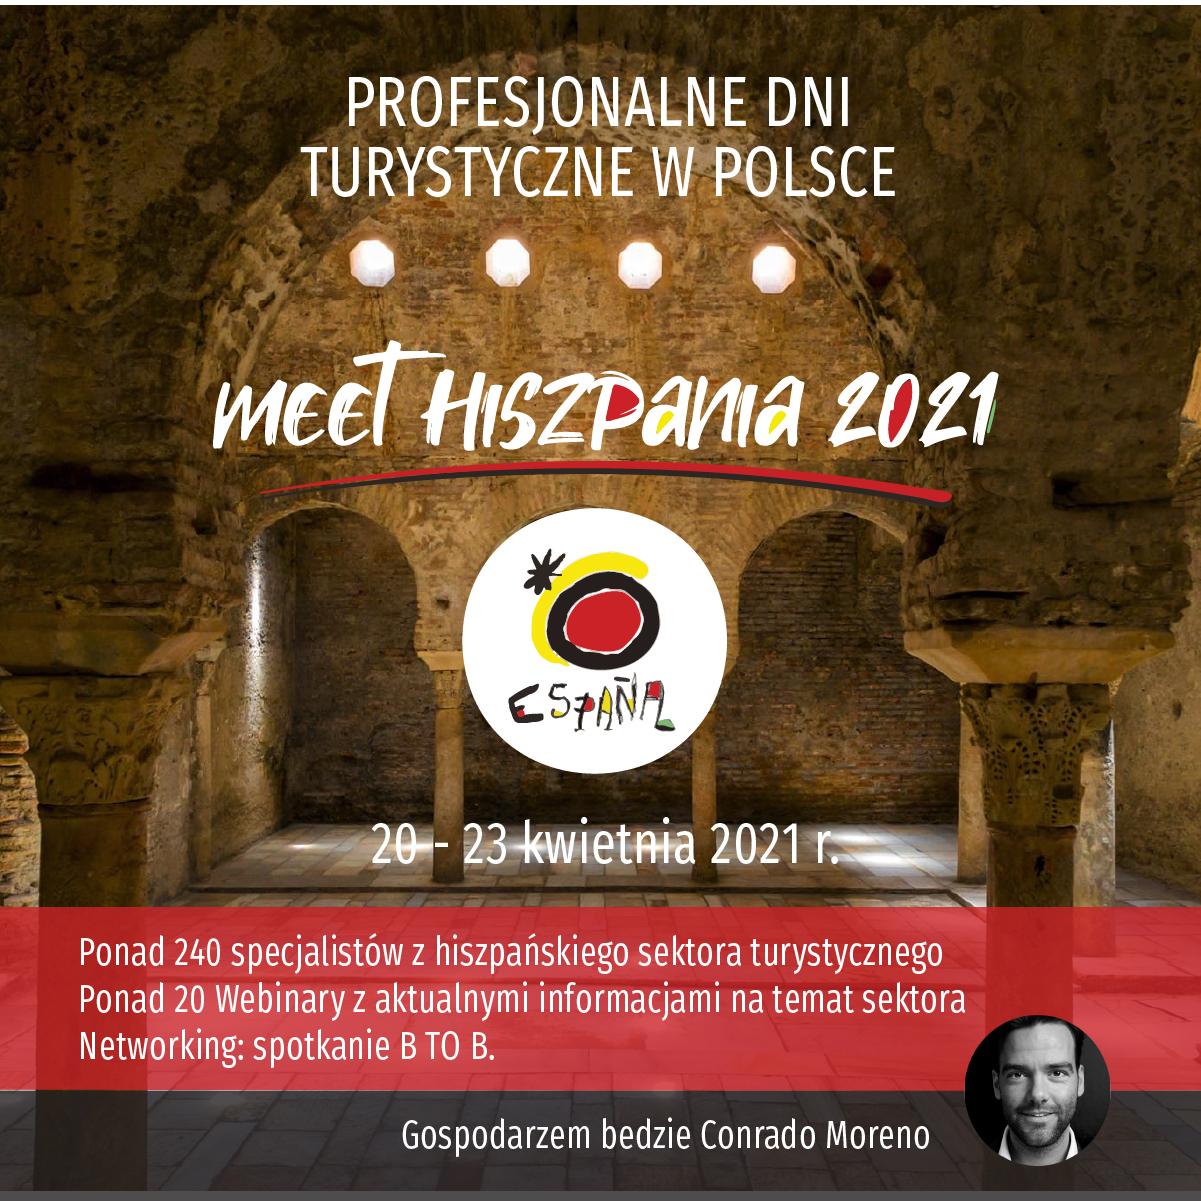 Meet Hiszpania 2021